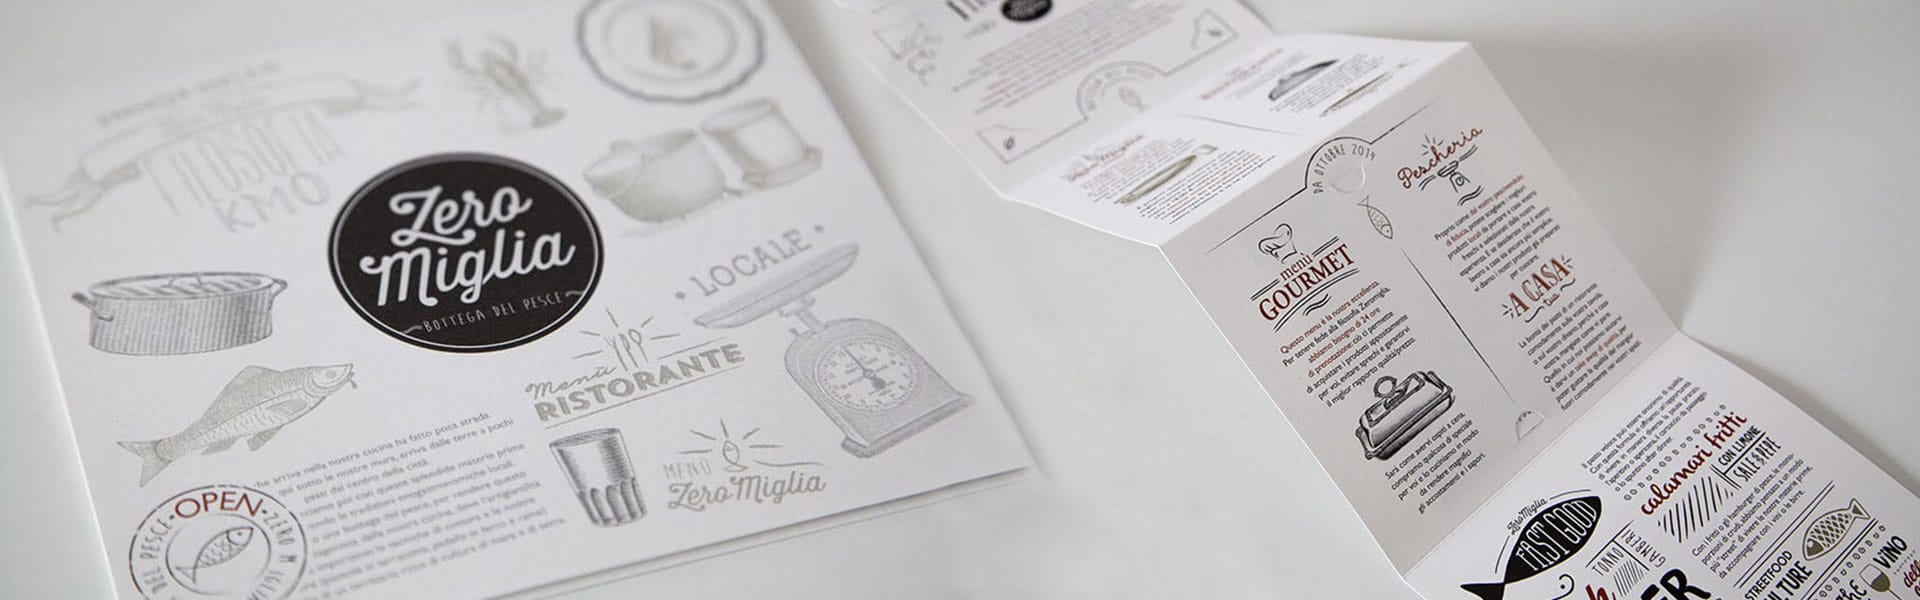 Zeromiglia - Brand Image 1